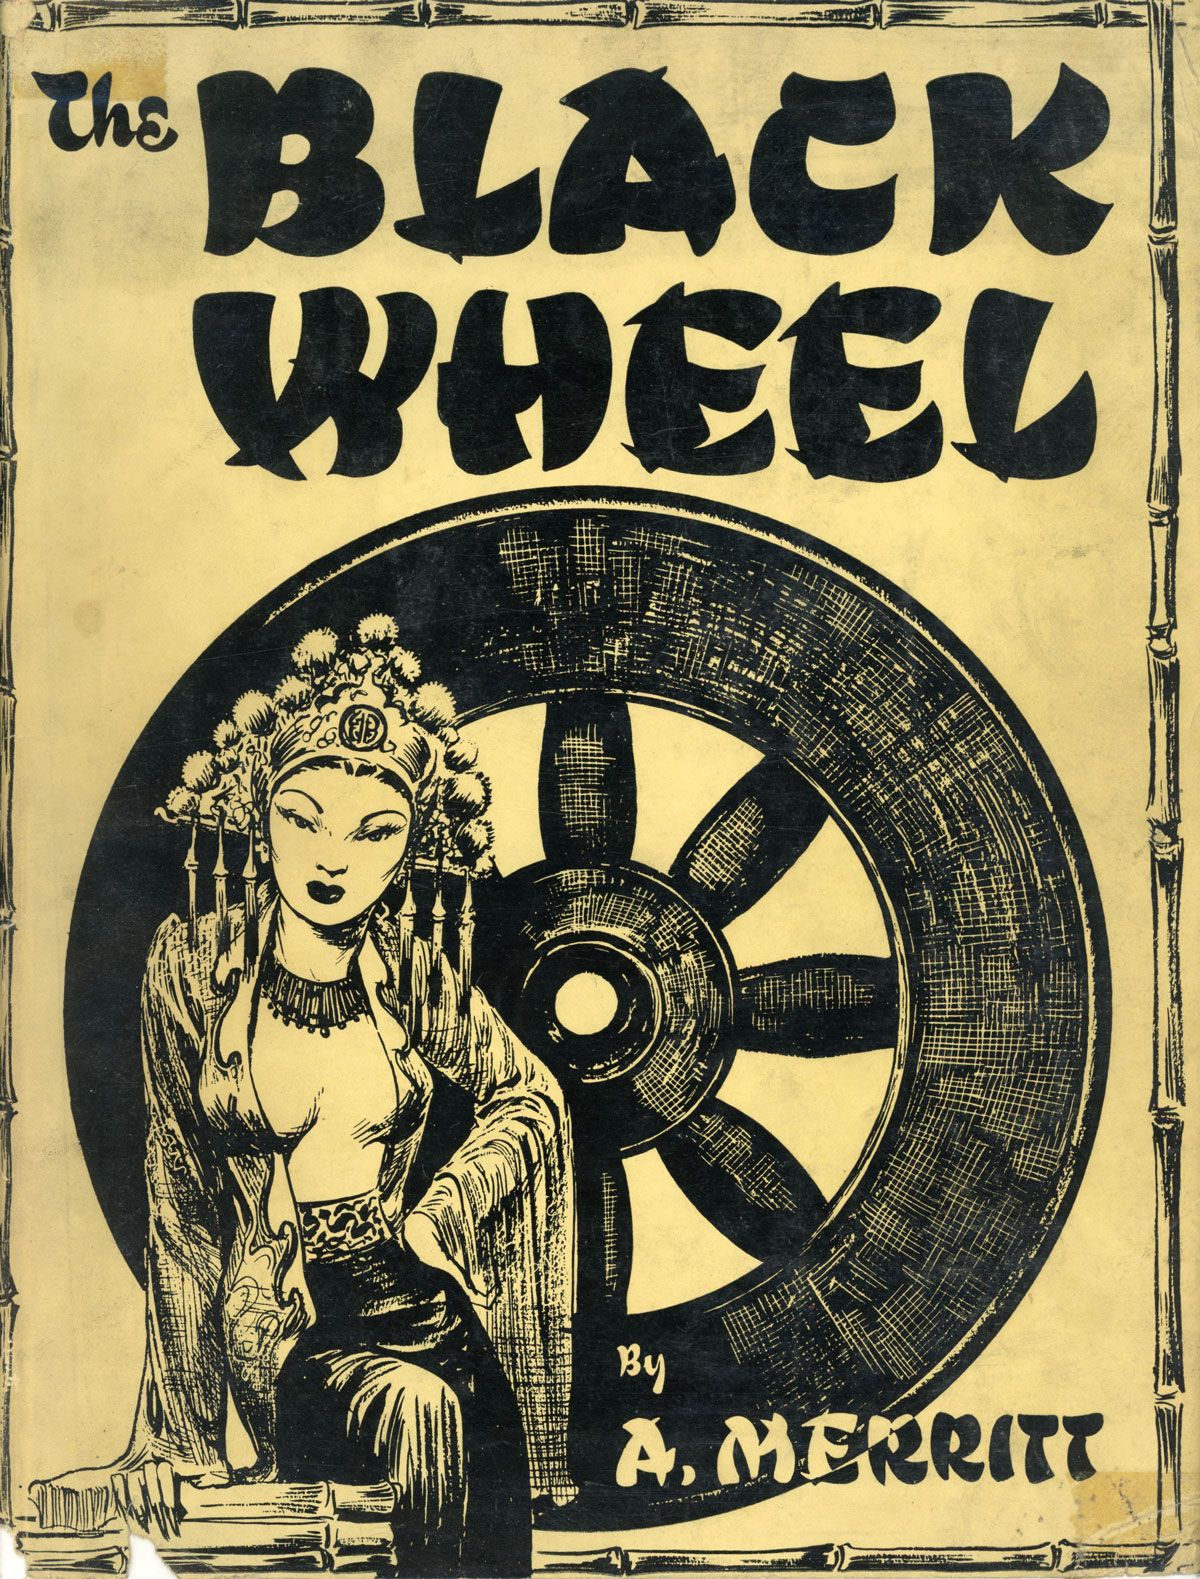 merritt-bwheel1.jpg